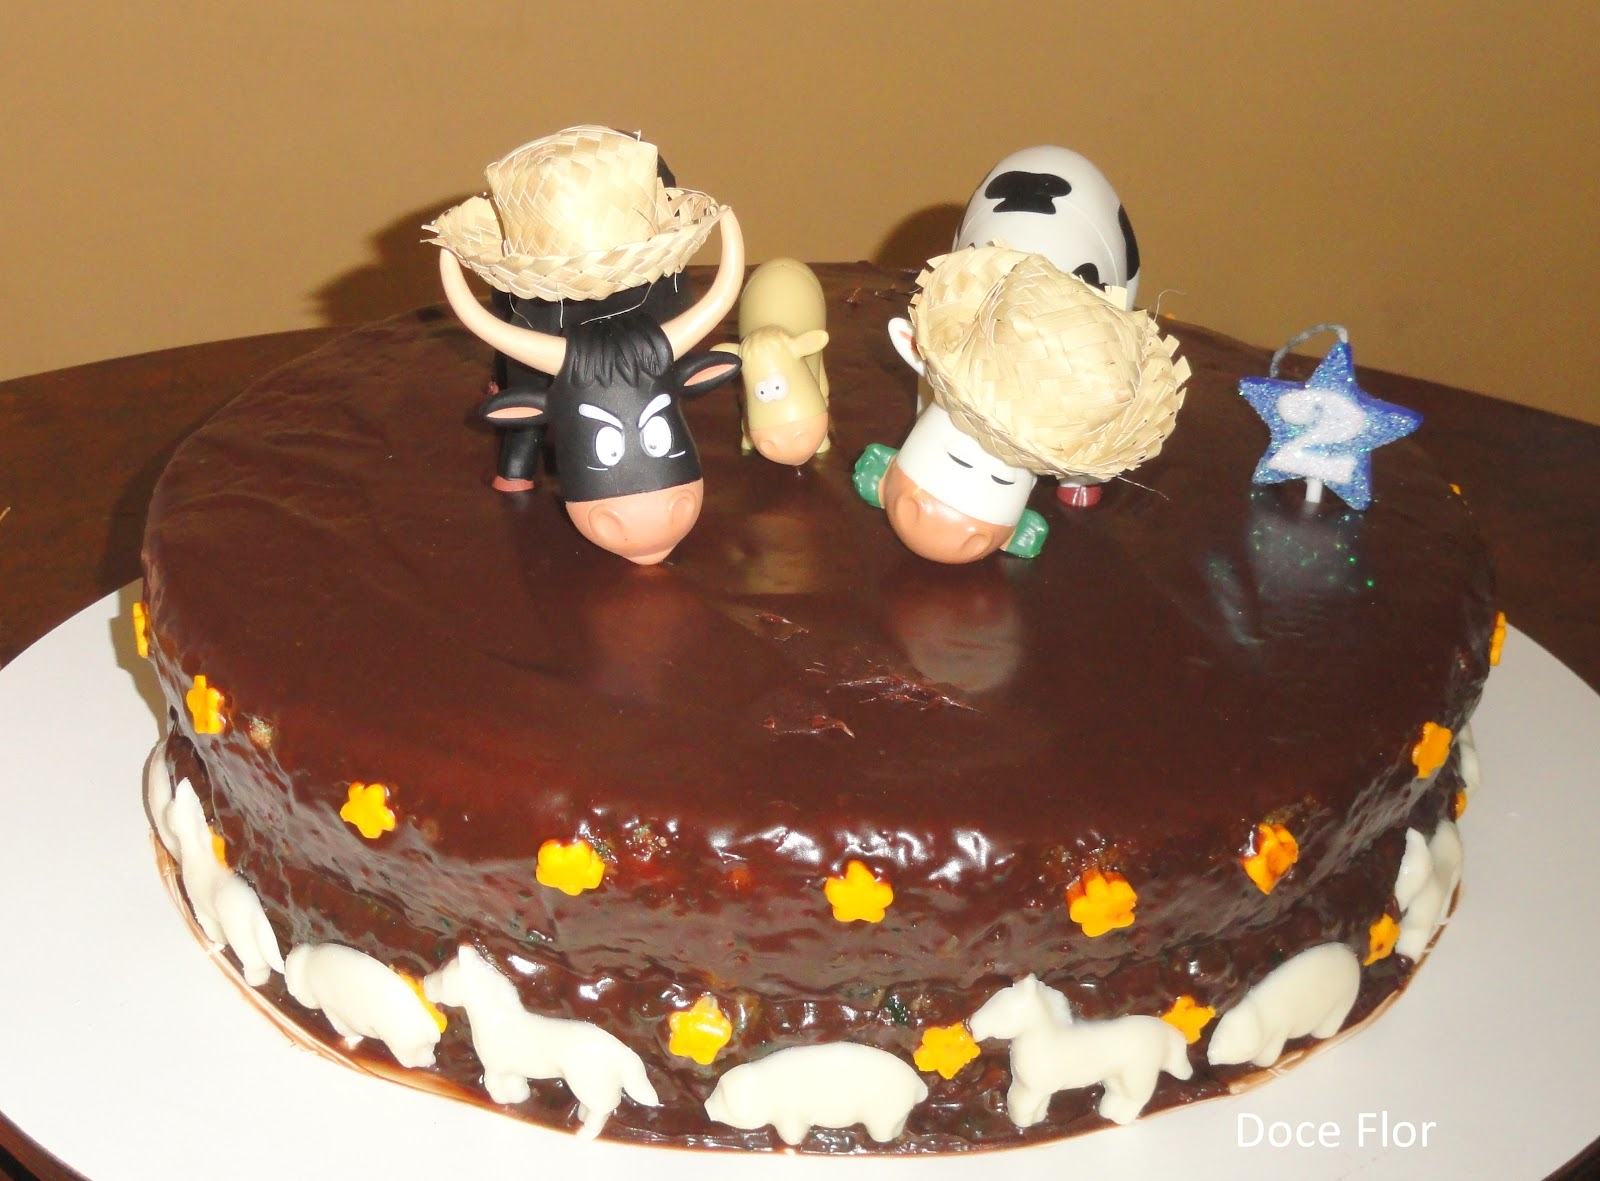 Feliz Aniversário wandheyr!!! Bolo